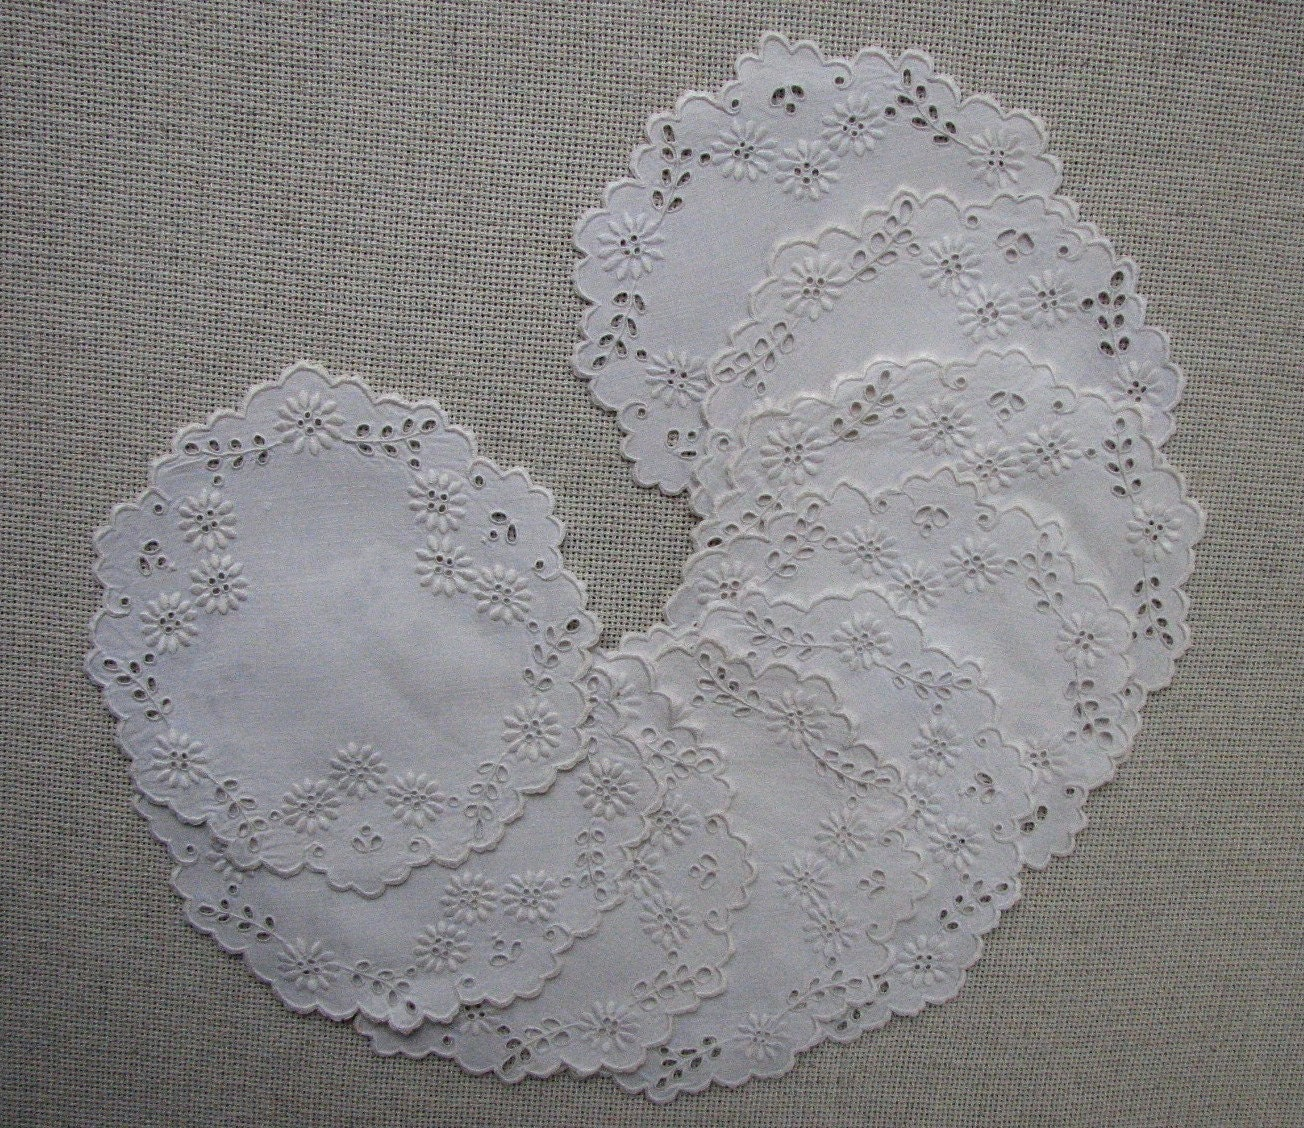 Embroidery fabric definition makaroka